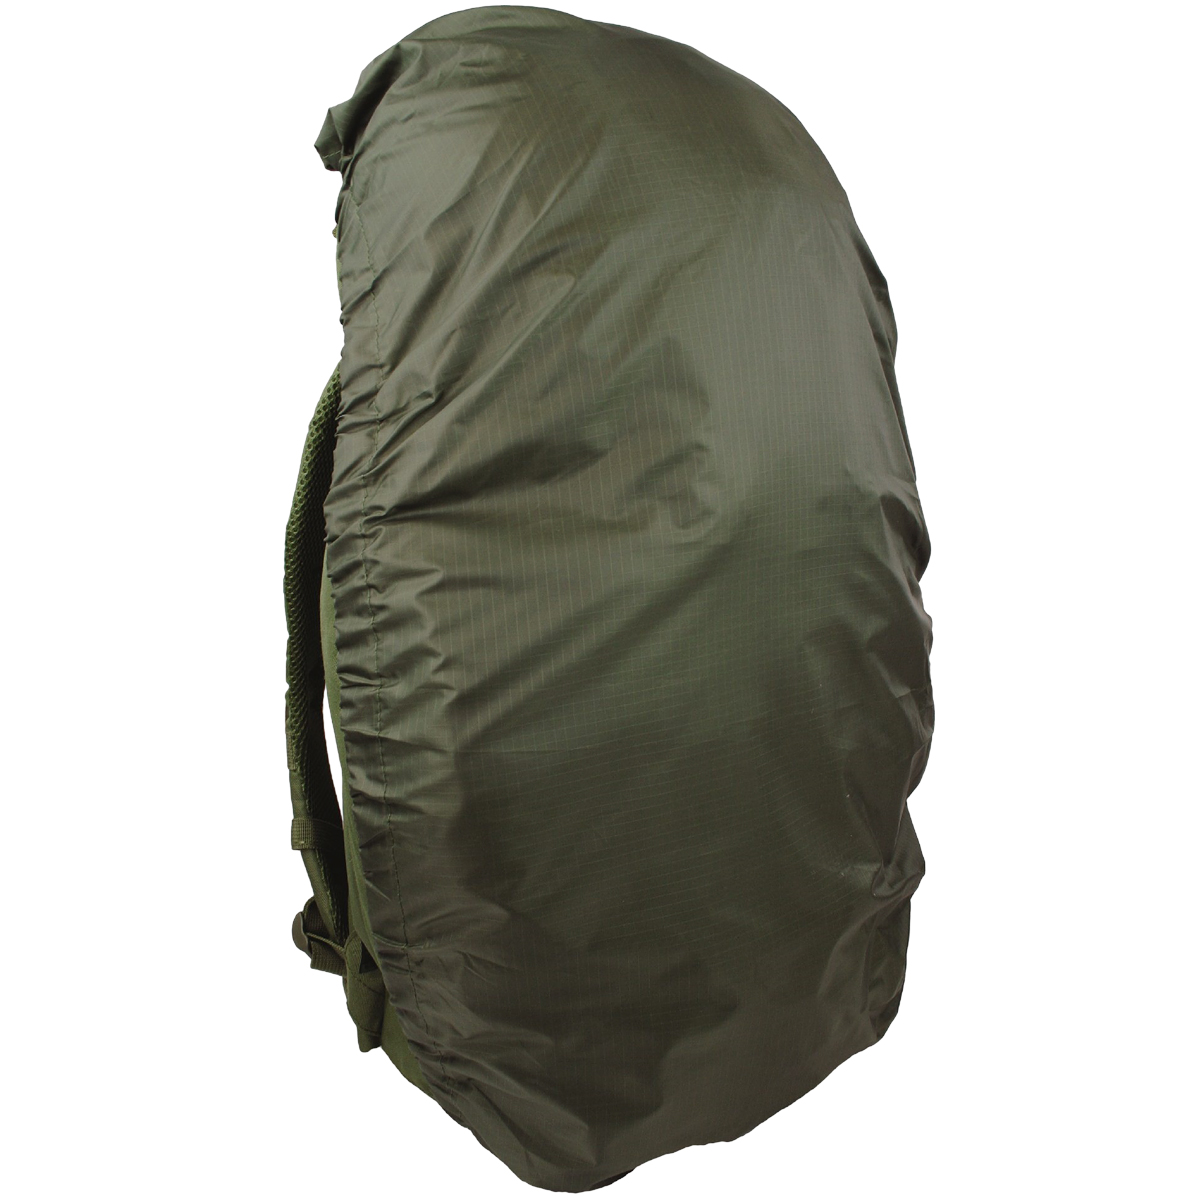 Travel Rucksack Bag Bergen Day Back Pack Backpack Rain Waterproof Cover Black